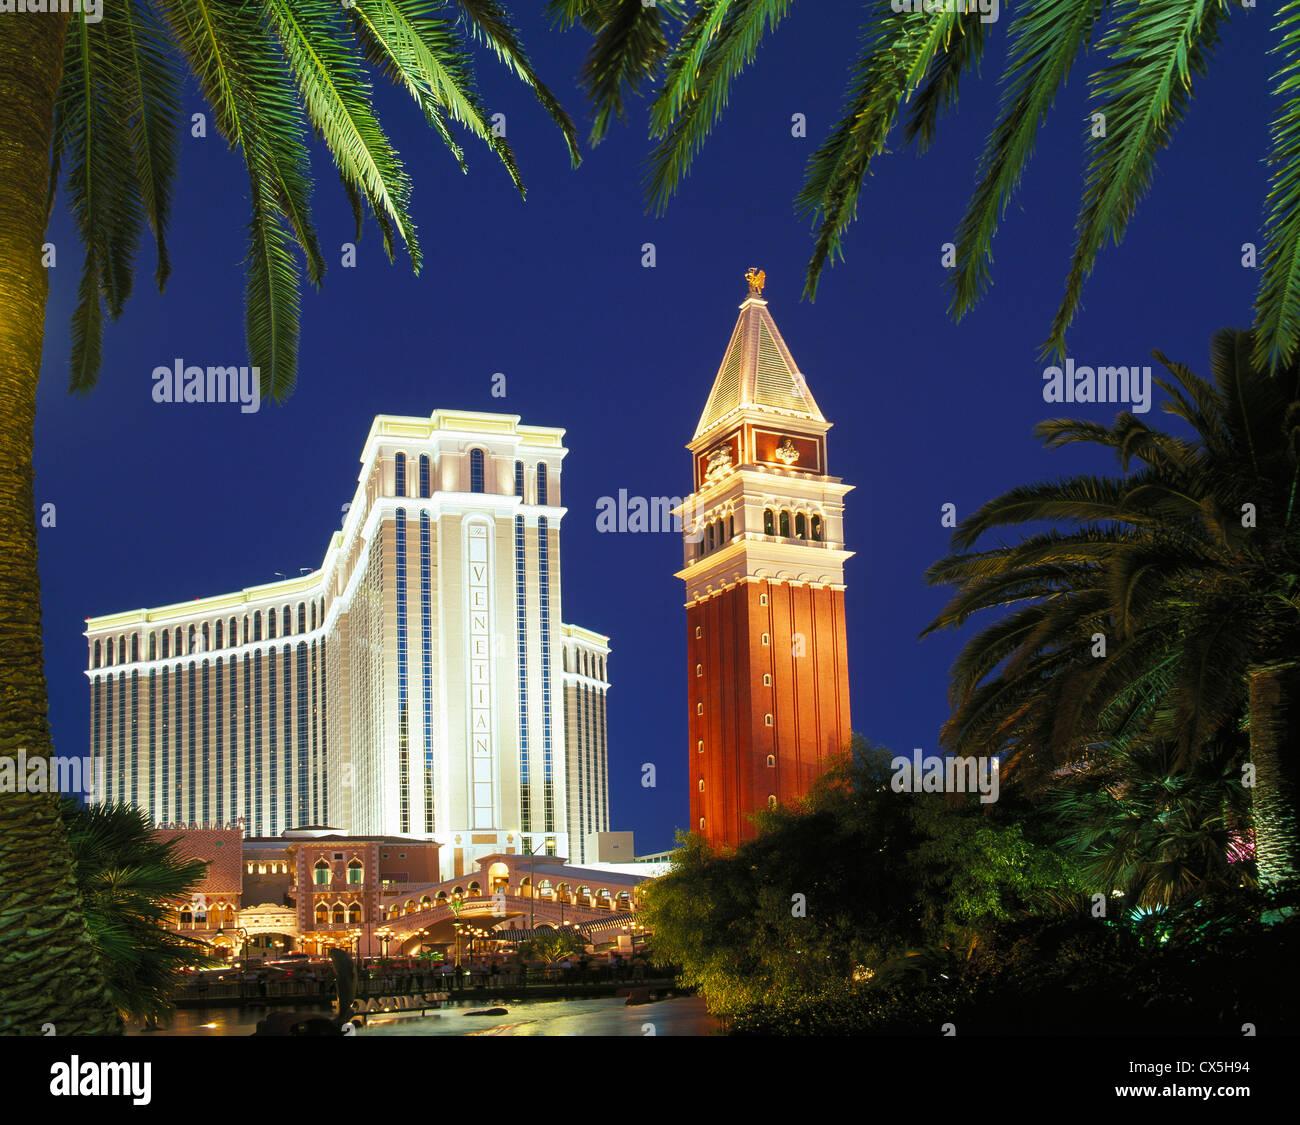 The Venetian Hotel and Casino, Las Vegas, Nevada, USA - Stock Image